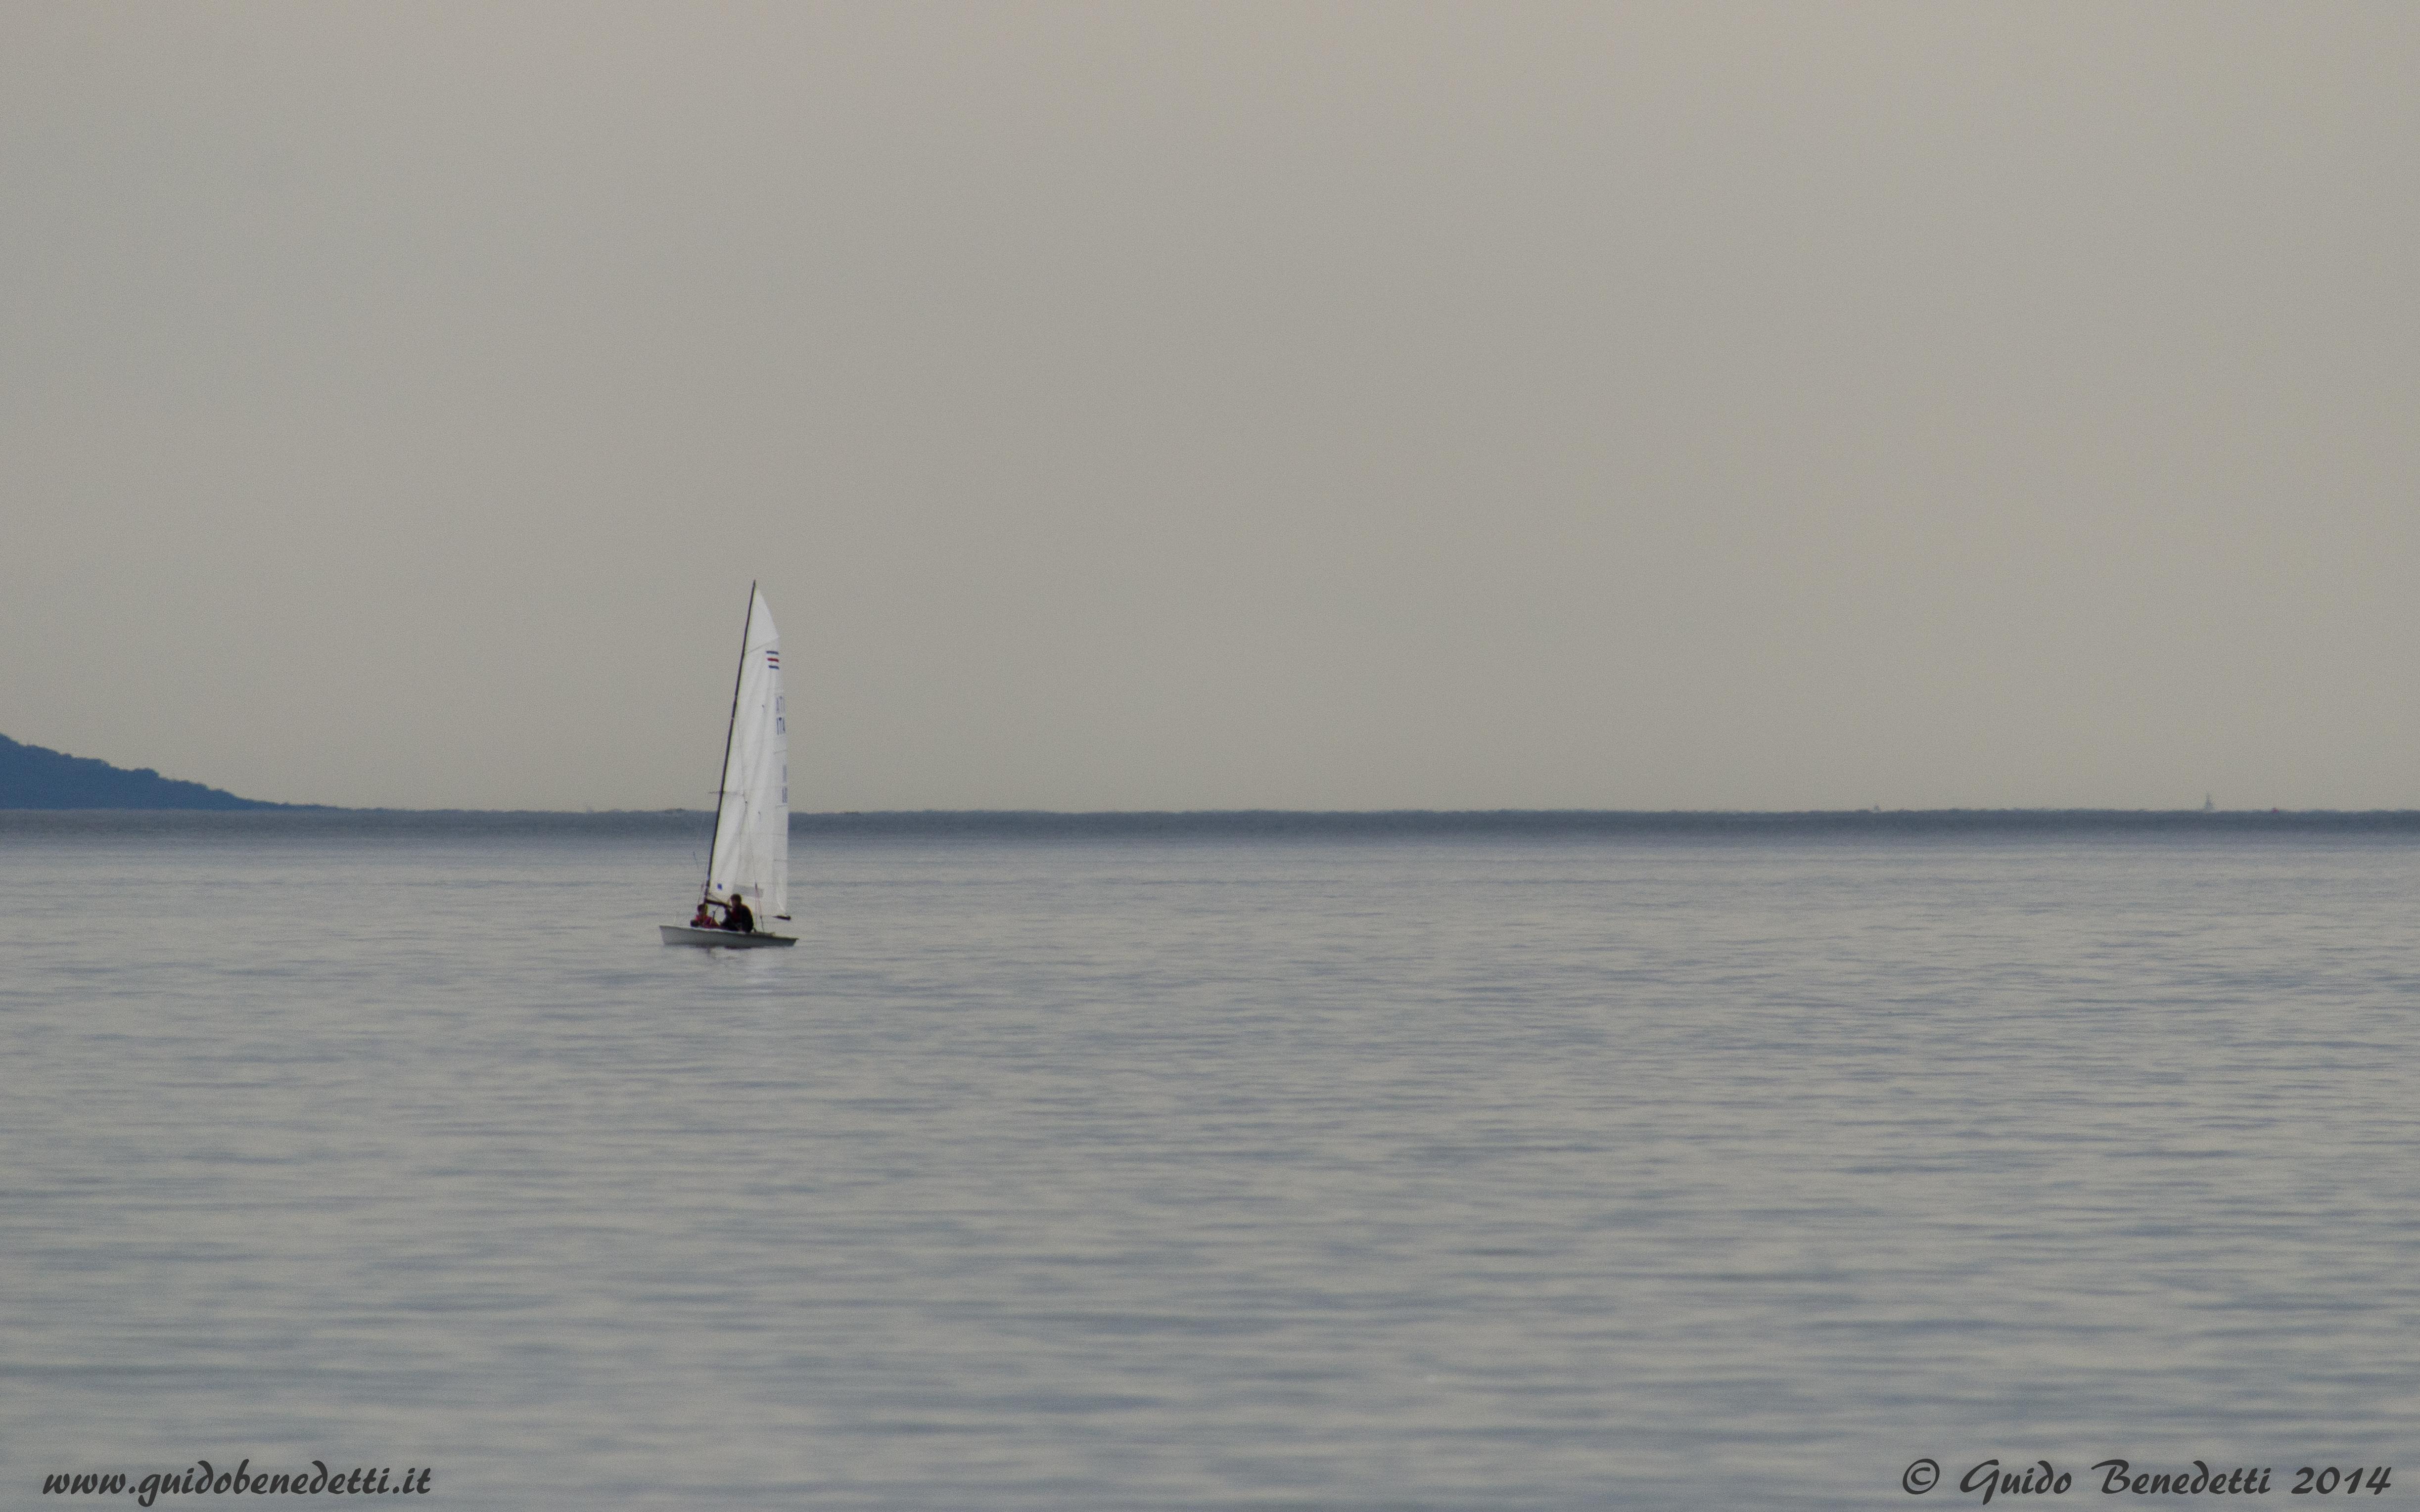 Veleggiando in solitaria – Colore